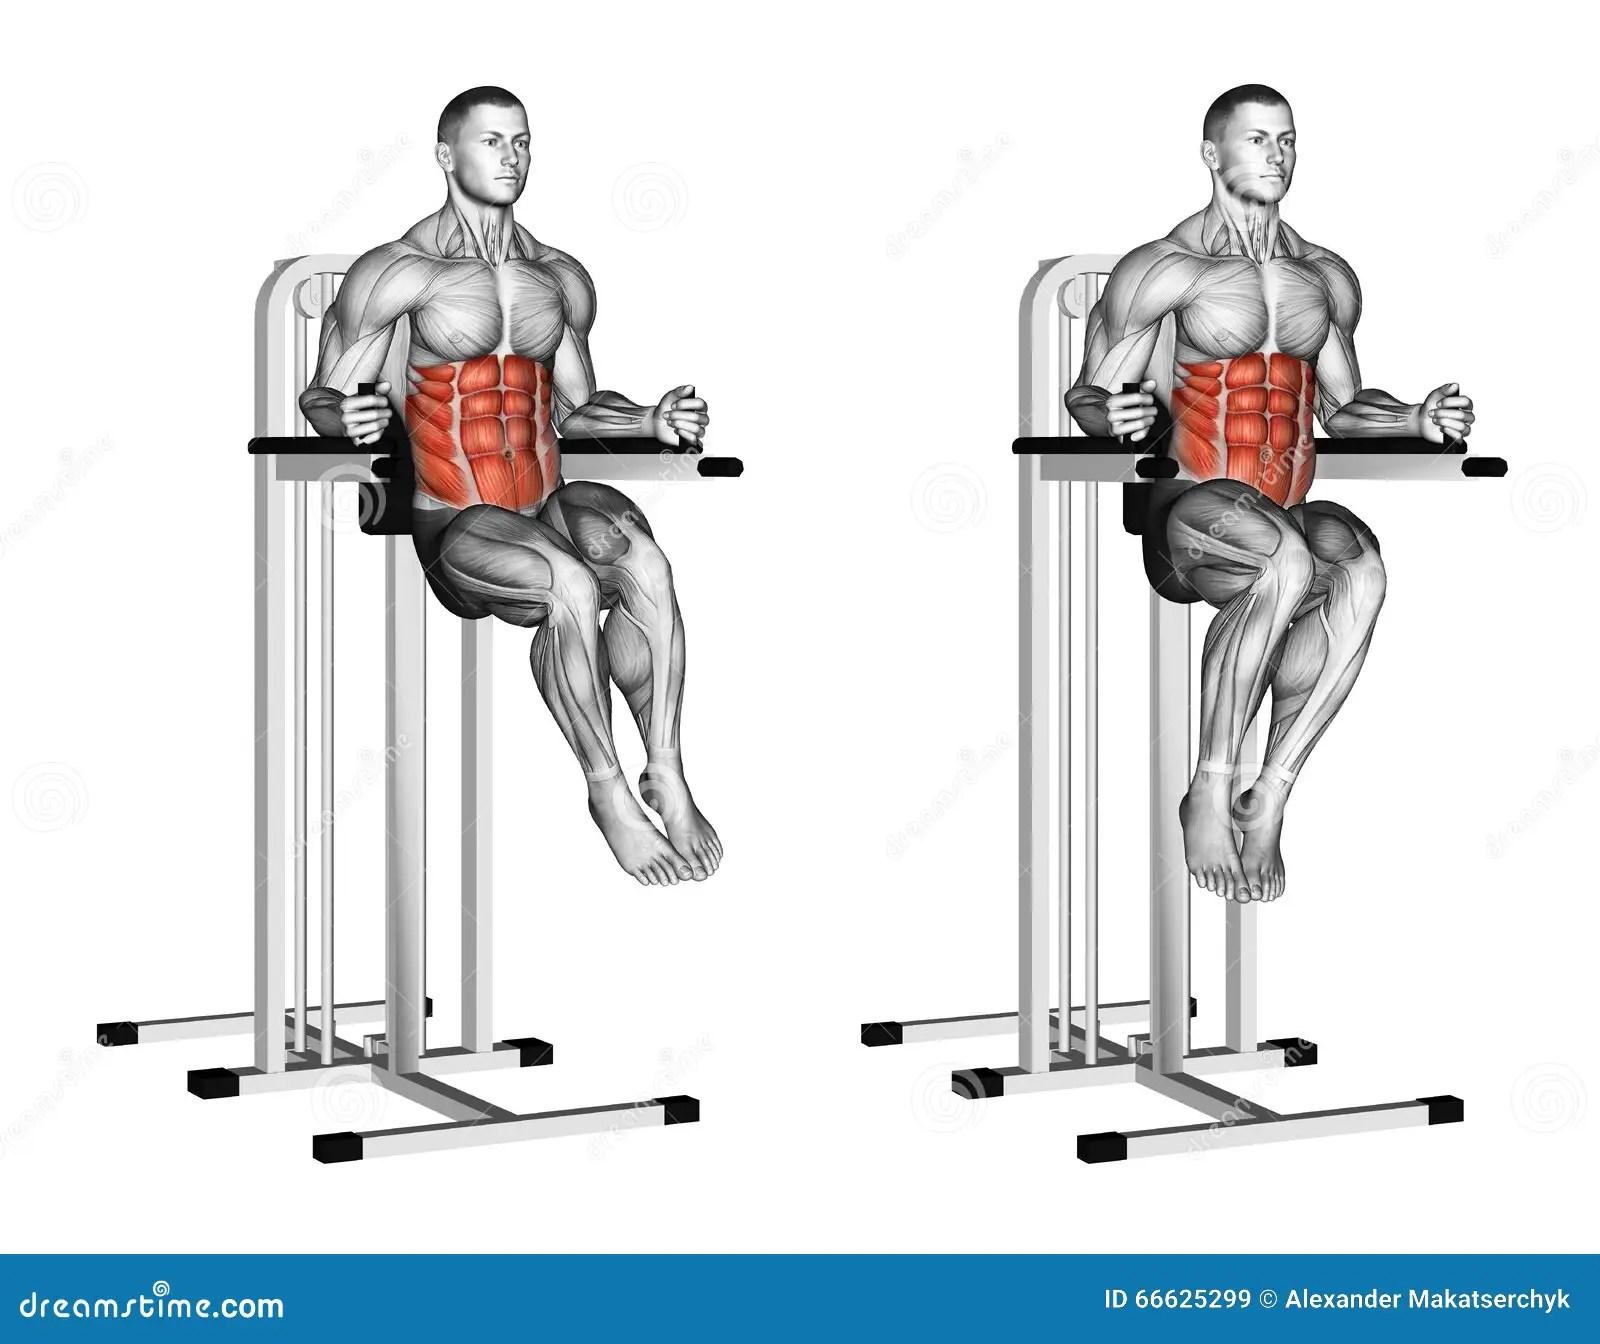 Captains Chair Workout